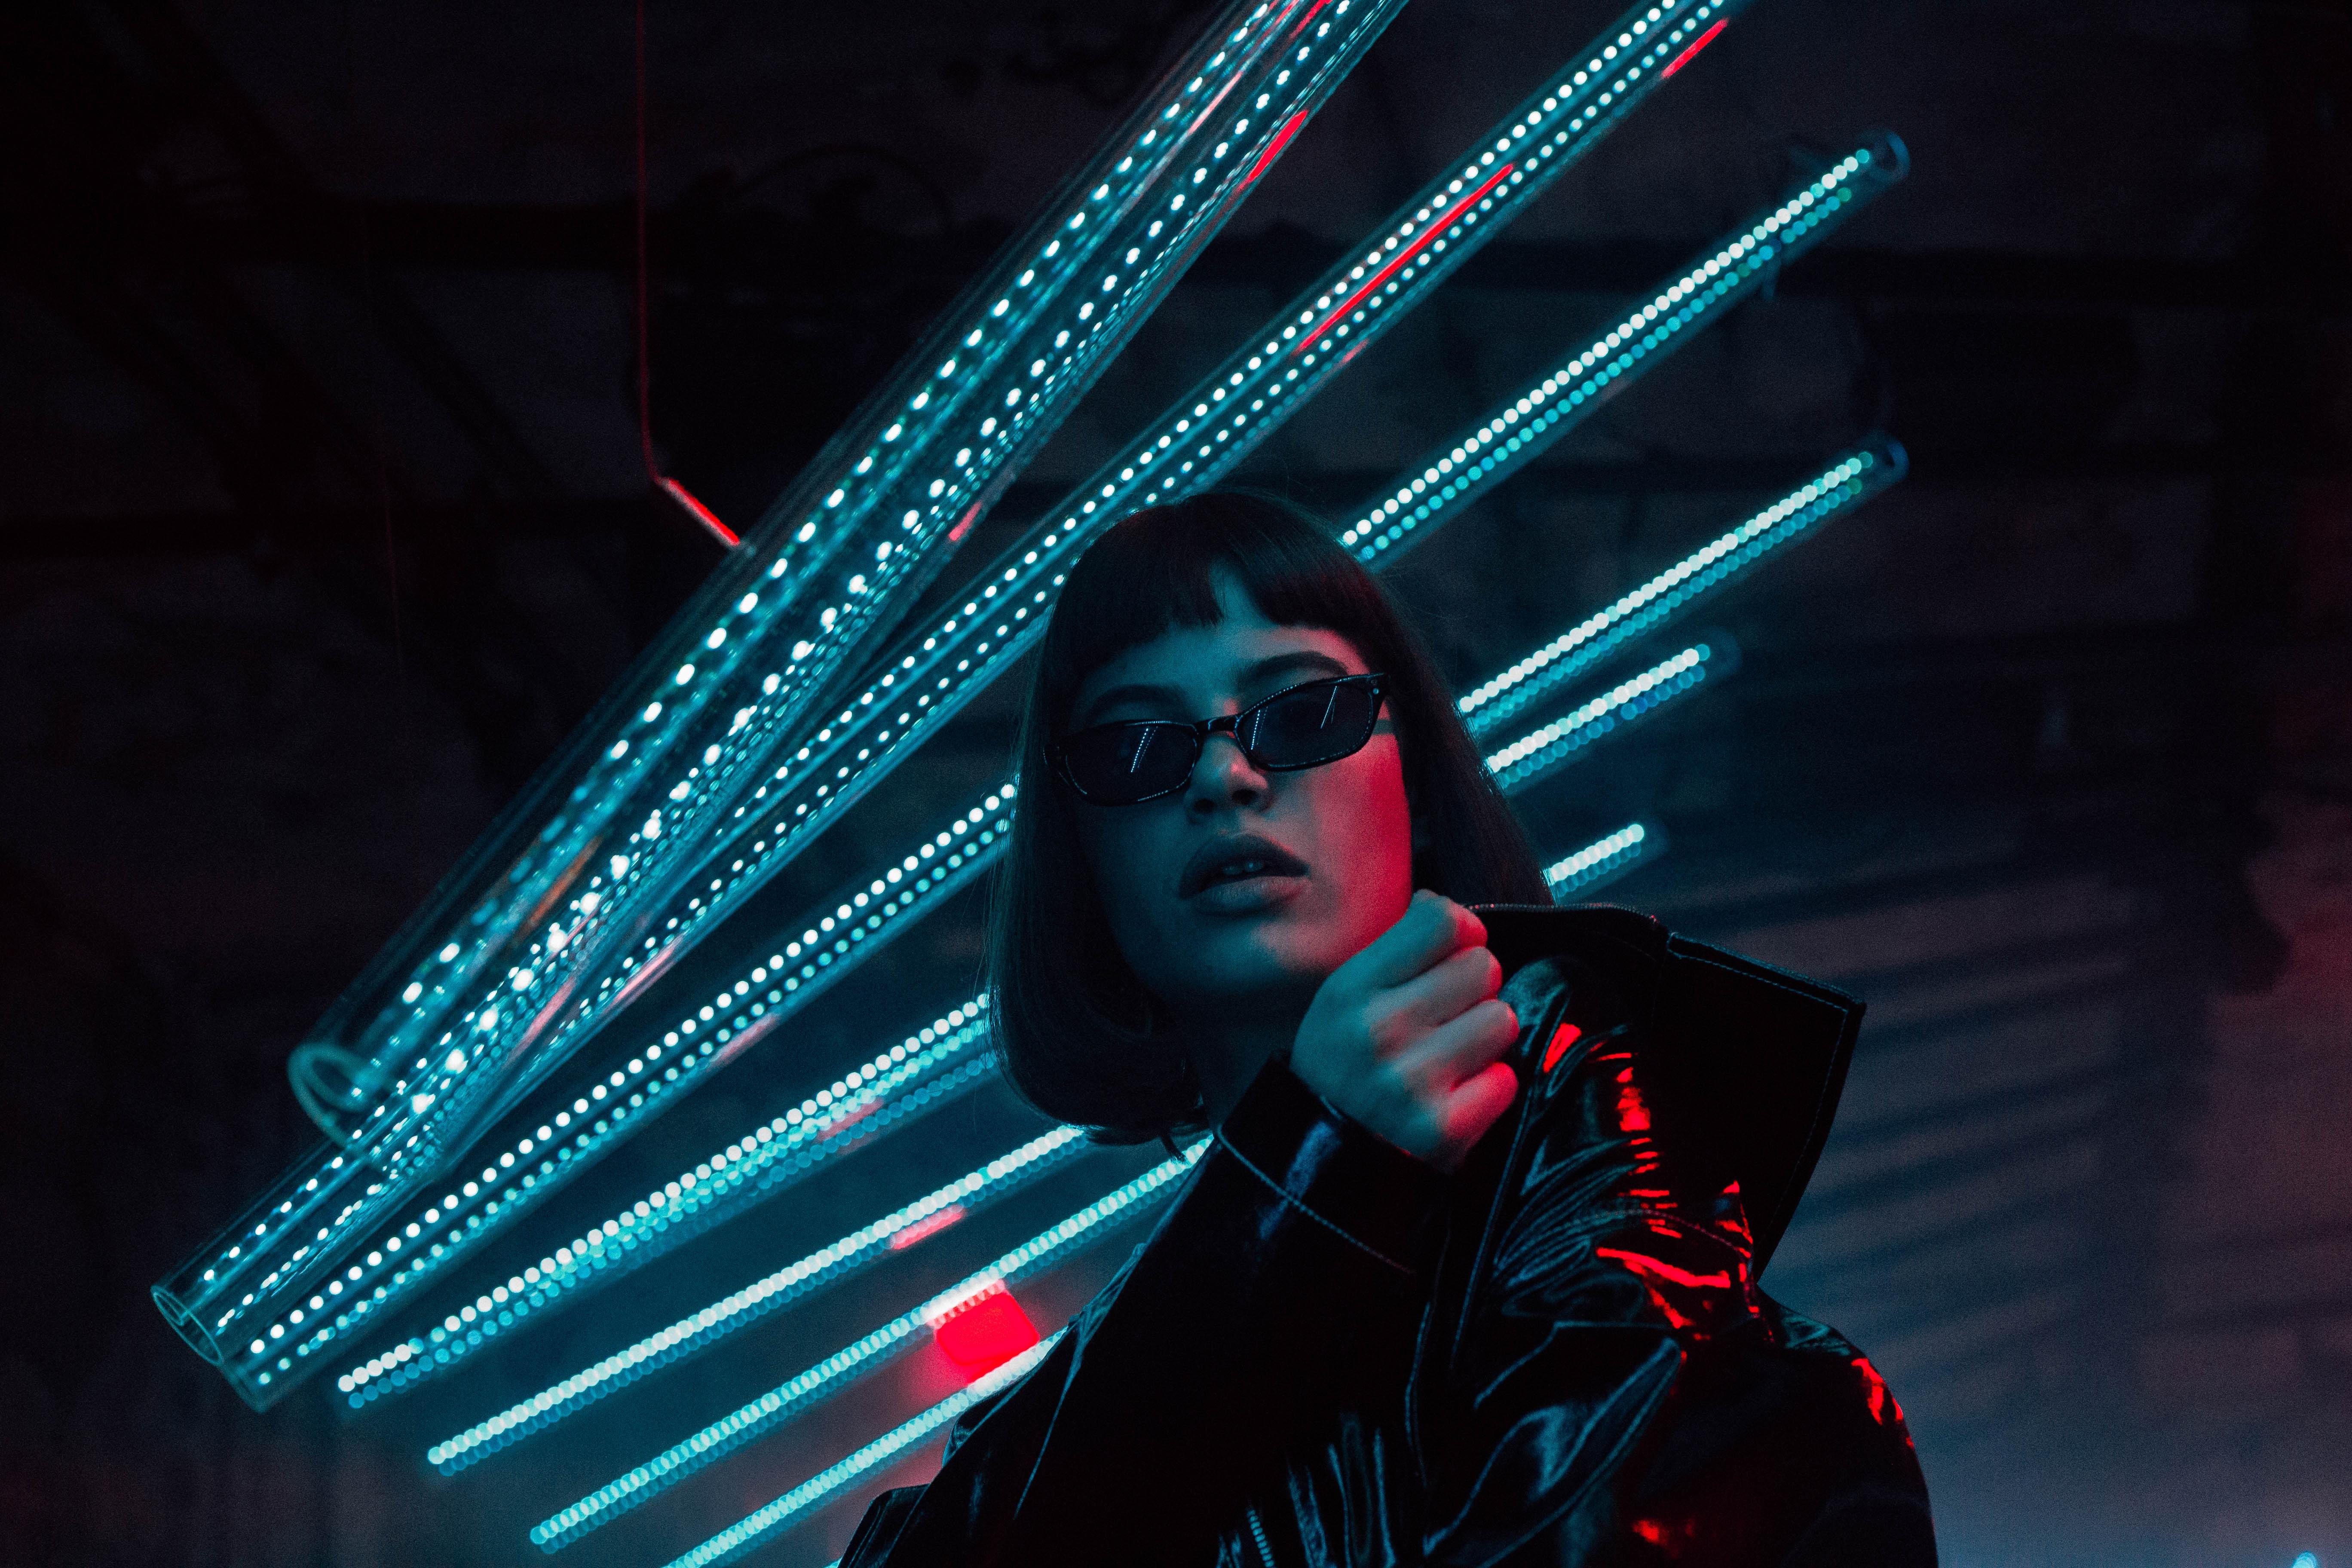 woman standing below blueneon lights